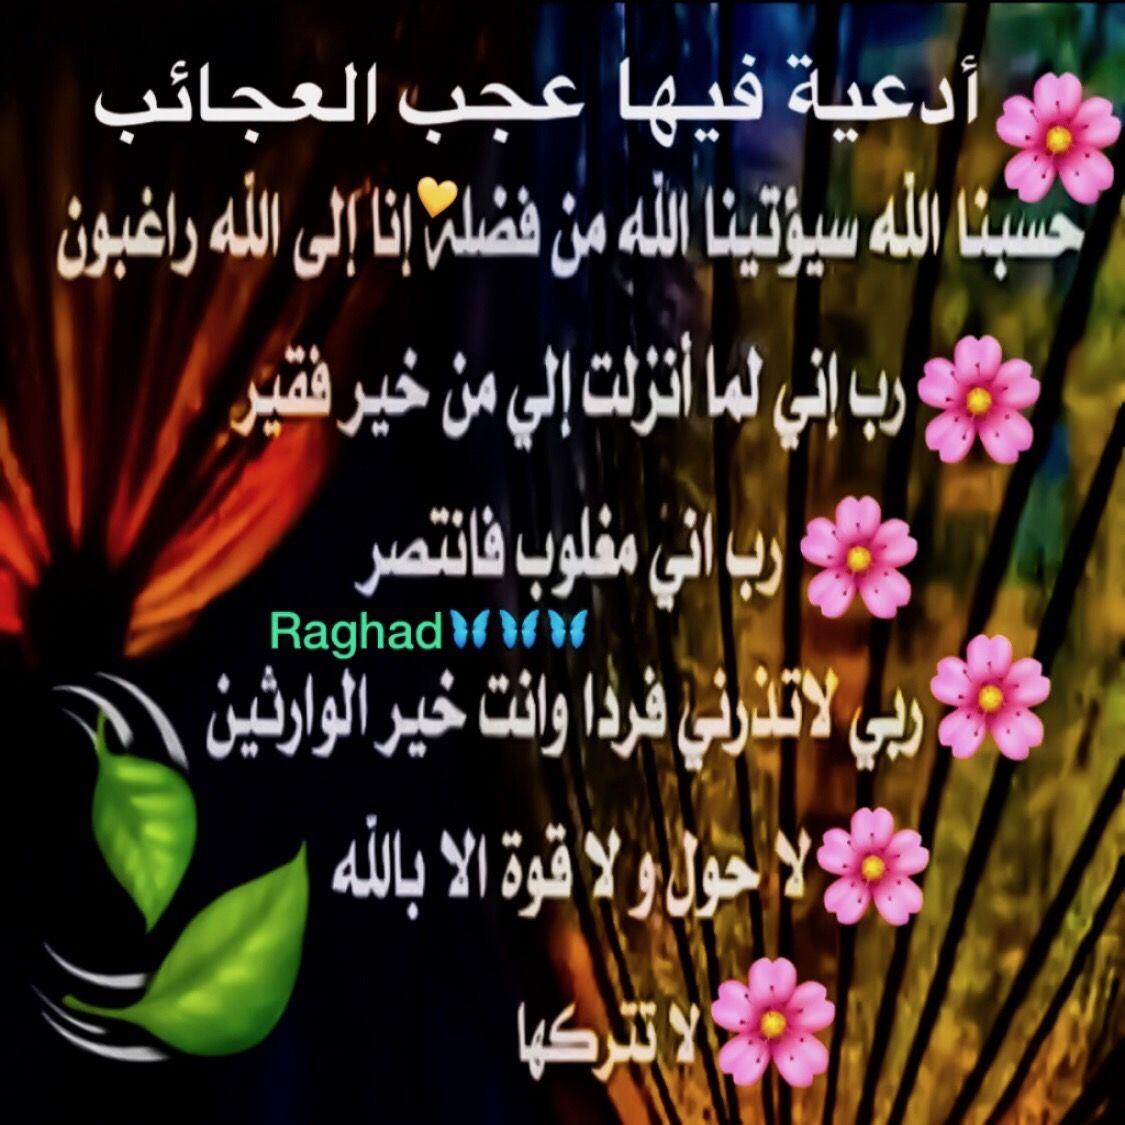 Desertrose أدعية قرآنية فيها عجب العجائب فلا تتركها